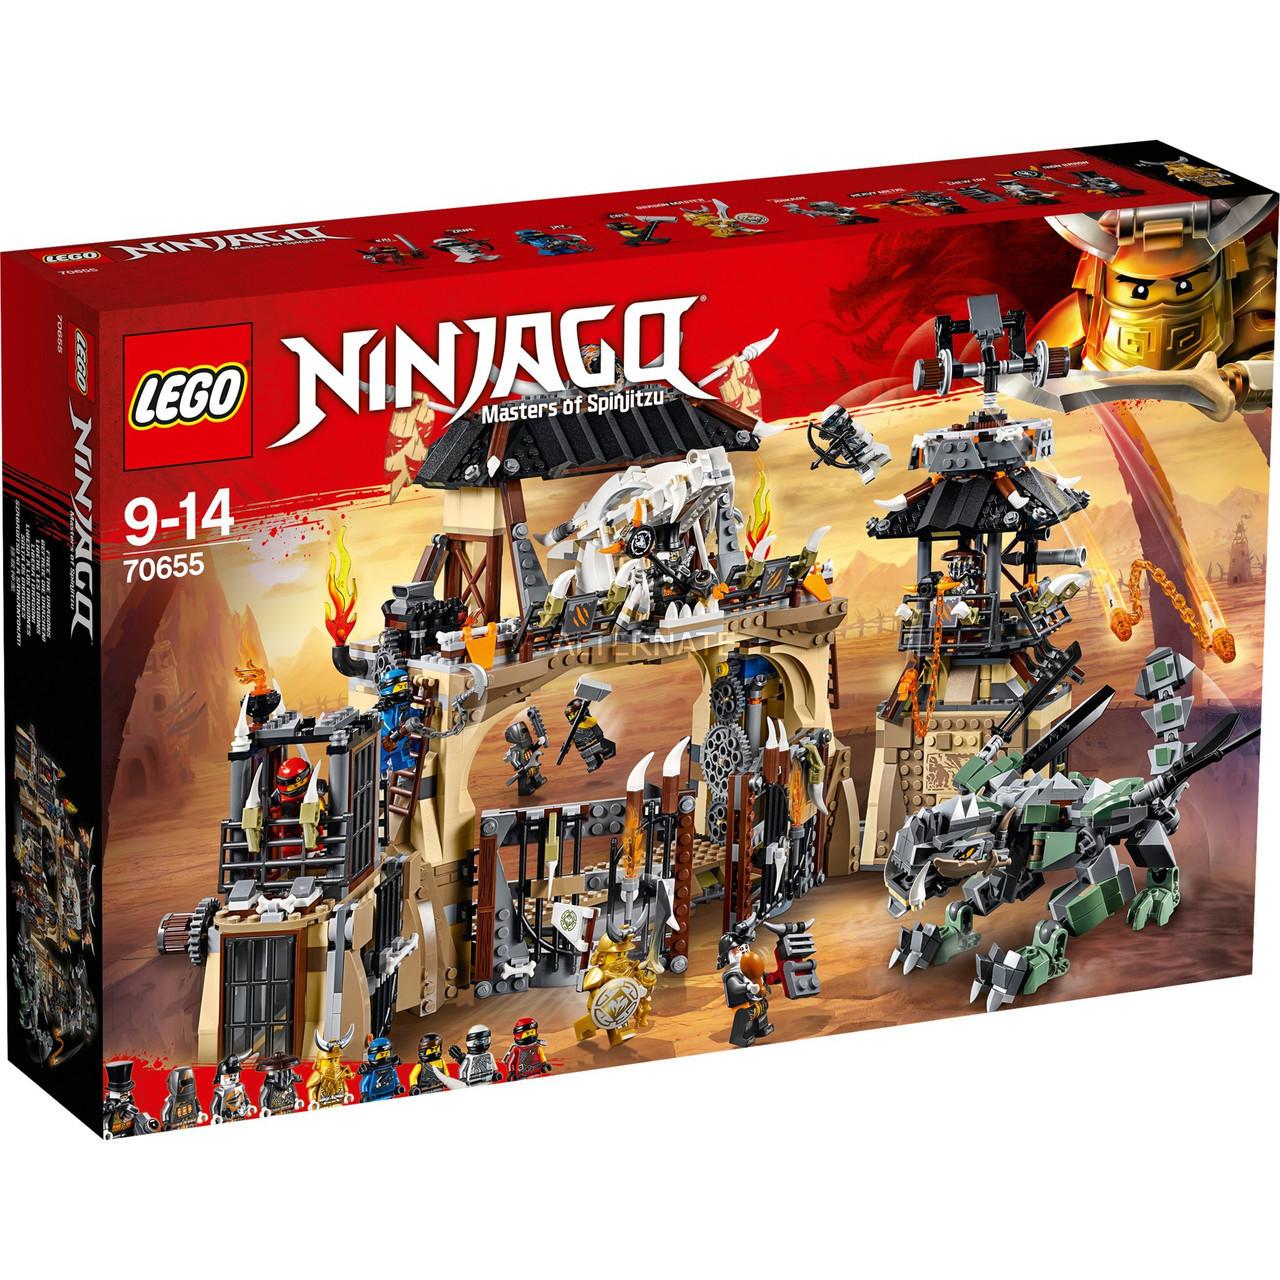 70655 Lego Ninjago Пещера драконов, Лего Ниндзяго